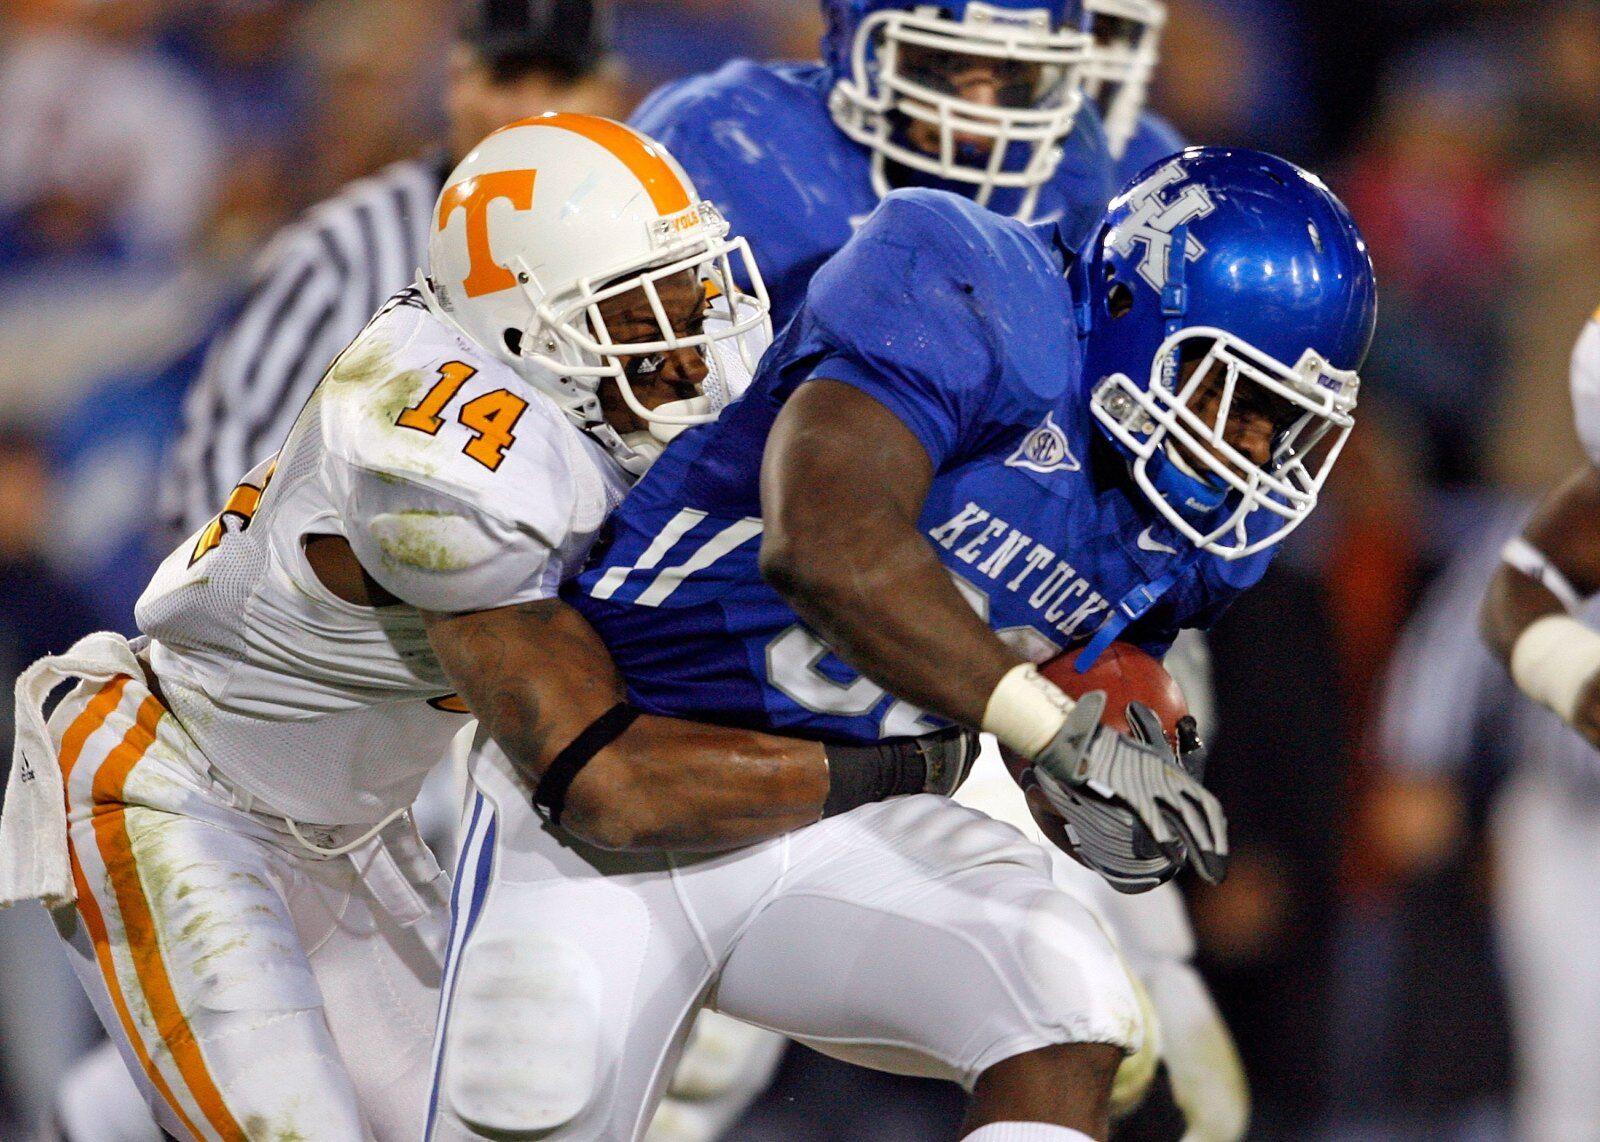 Uk Basketball: Tennessee Football: 5 Times The Vols Upset The Kentucky